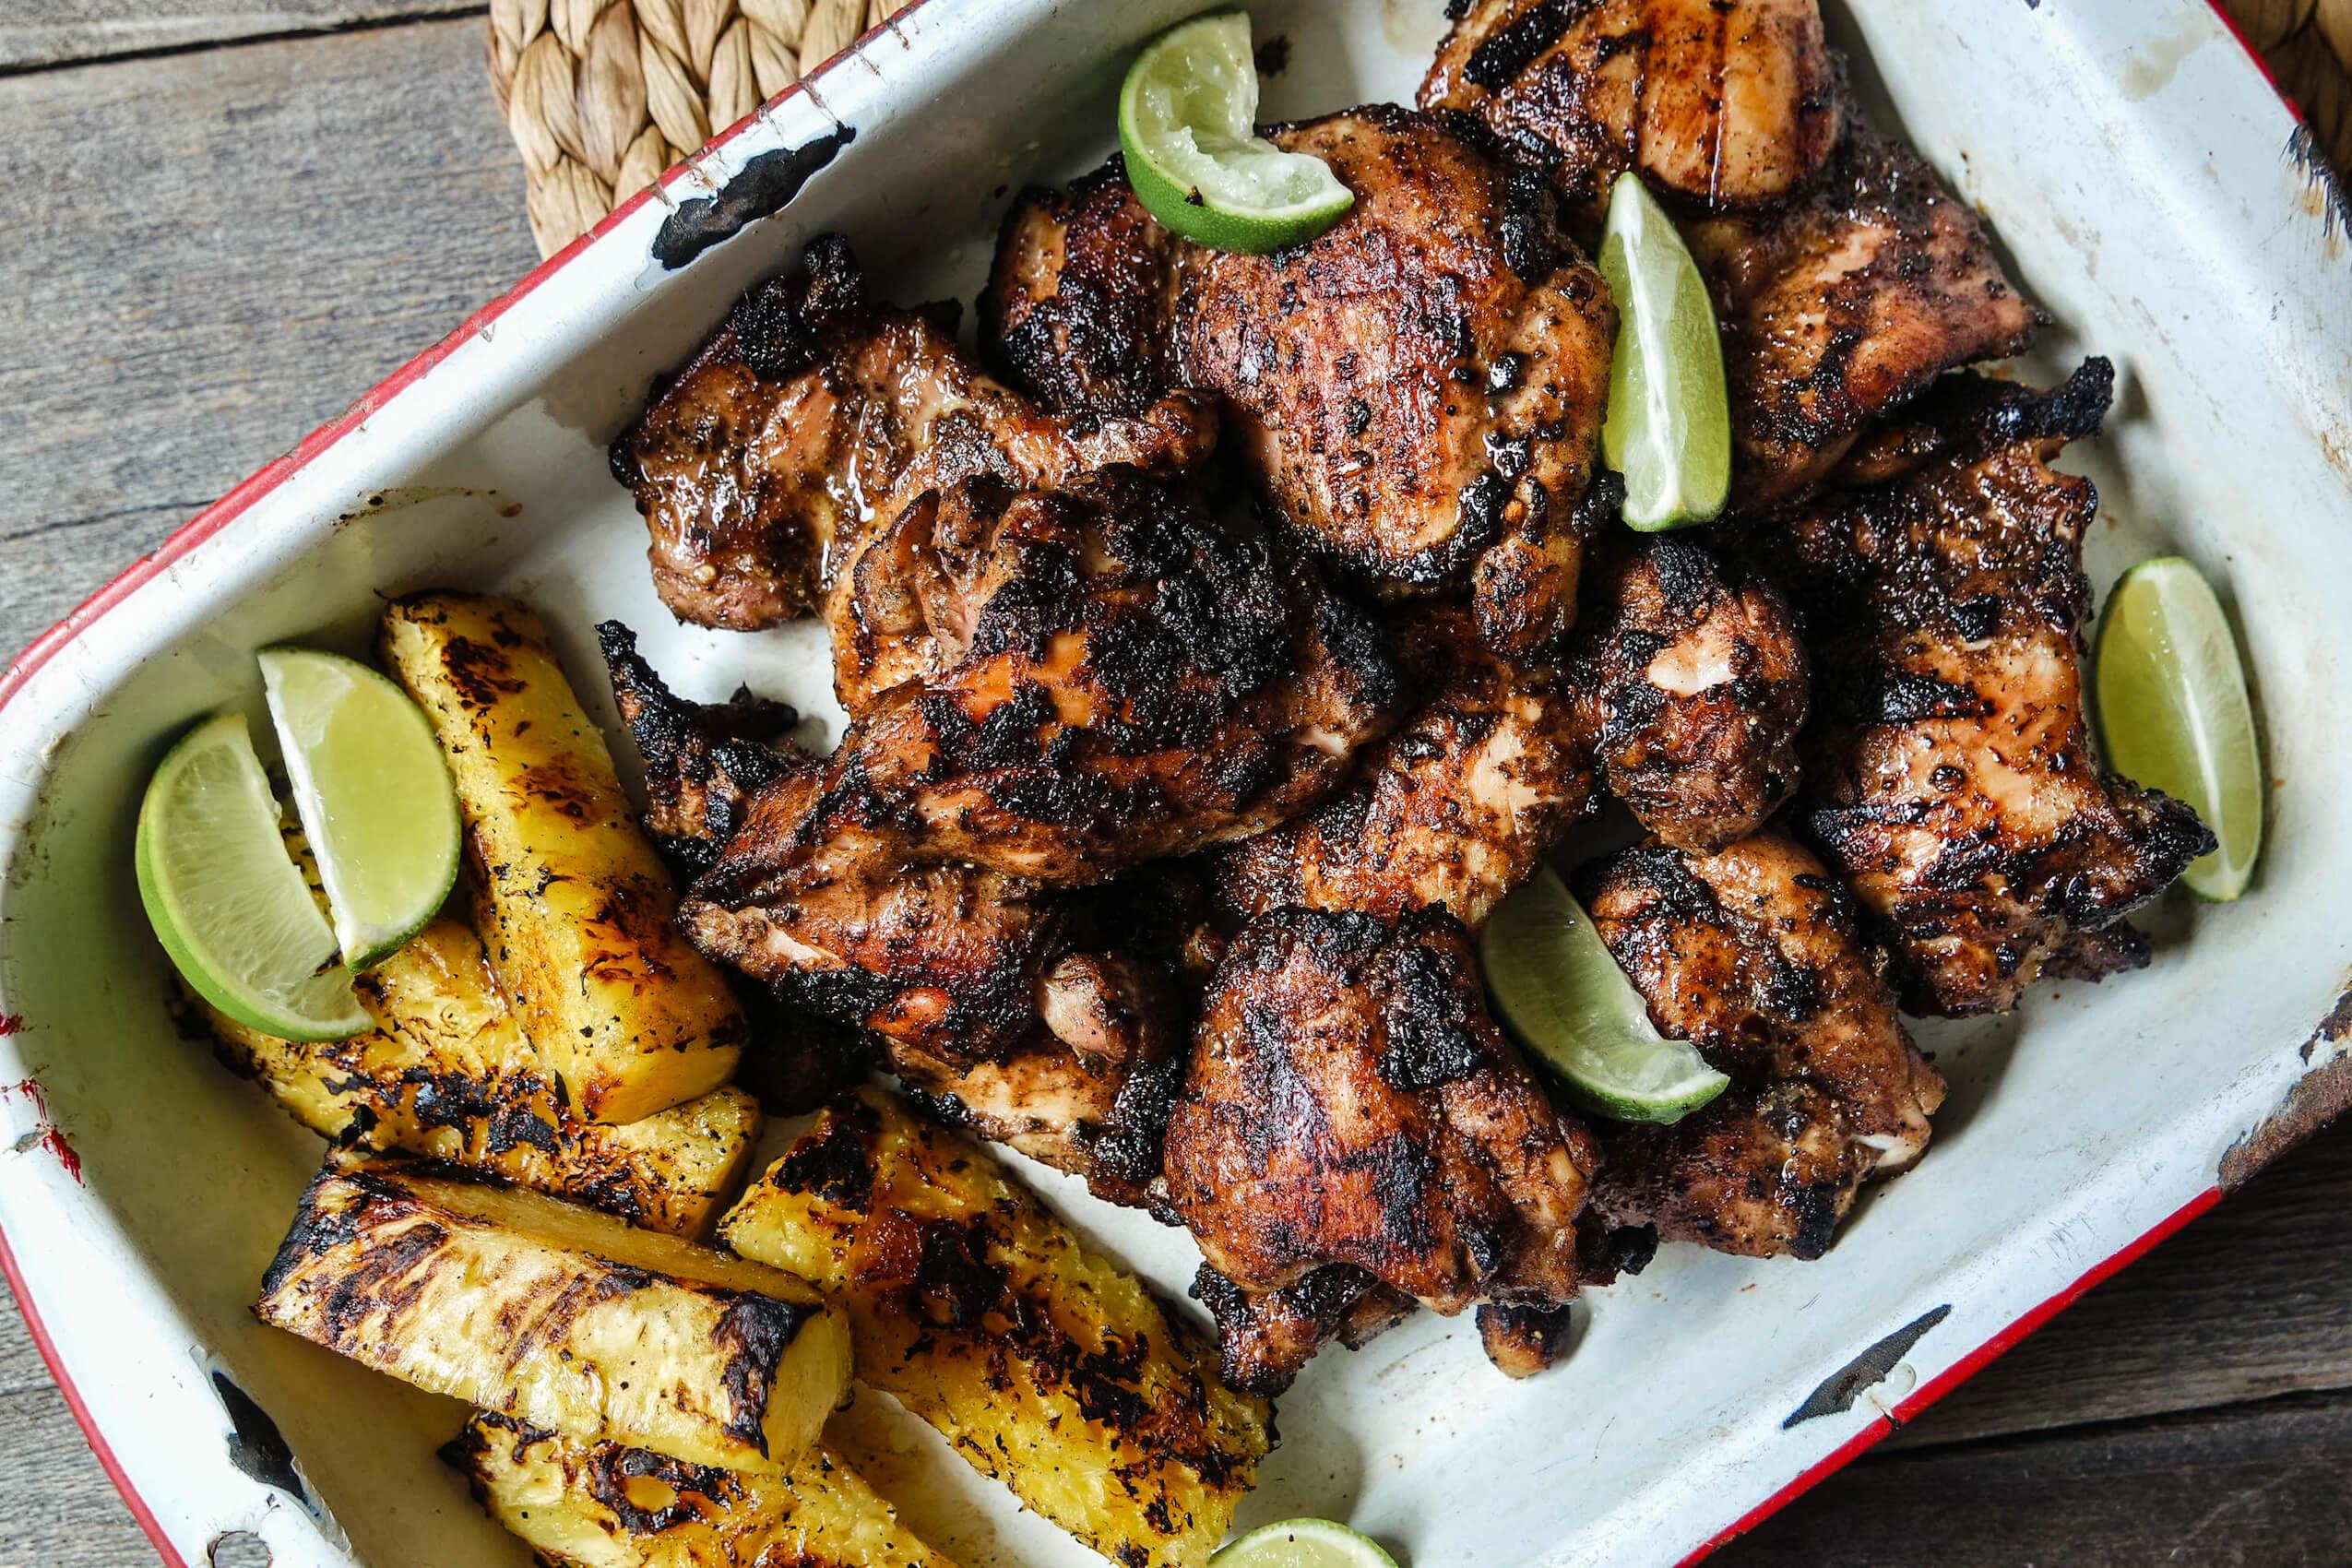 Fragrant Wood Grilled Jerk Chicken Thighs Jess Pryles